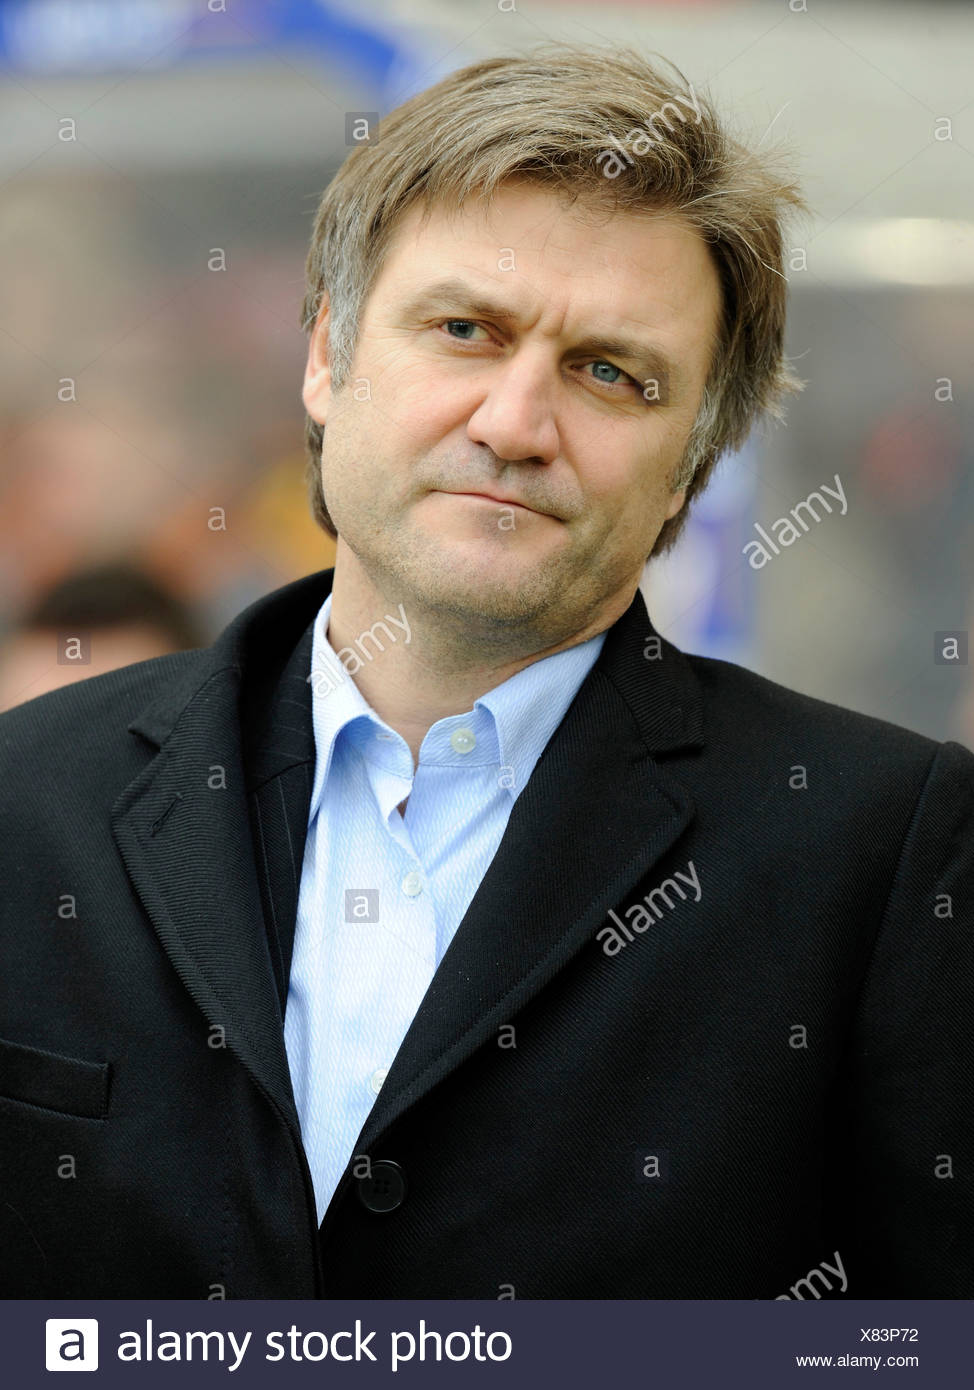 Head of sports Dietmar Beiersdorfer, Hamburger SV football club - Stock Image